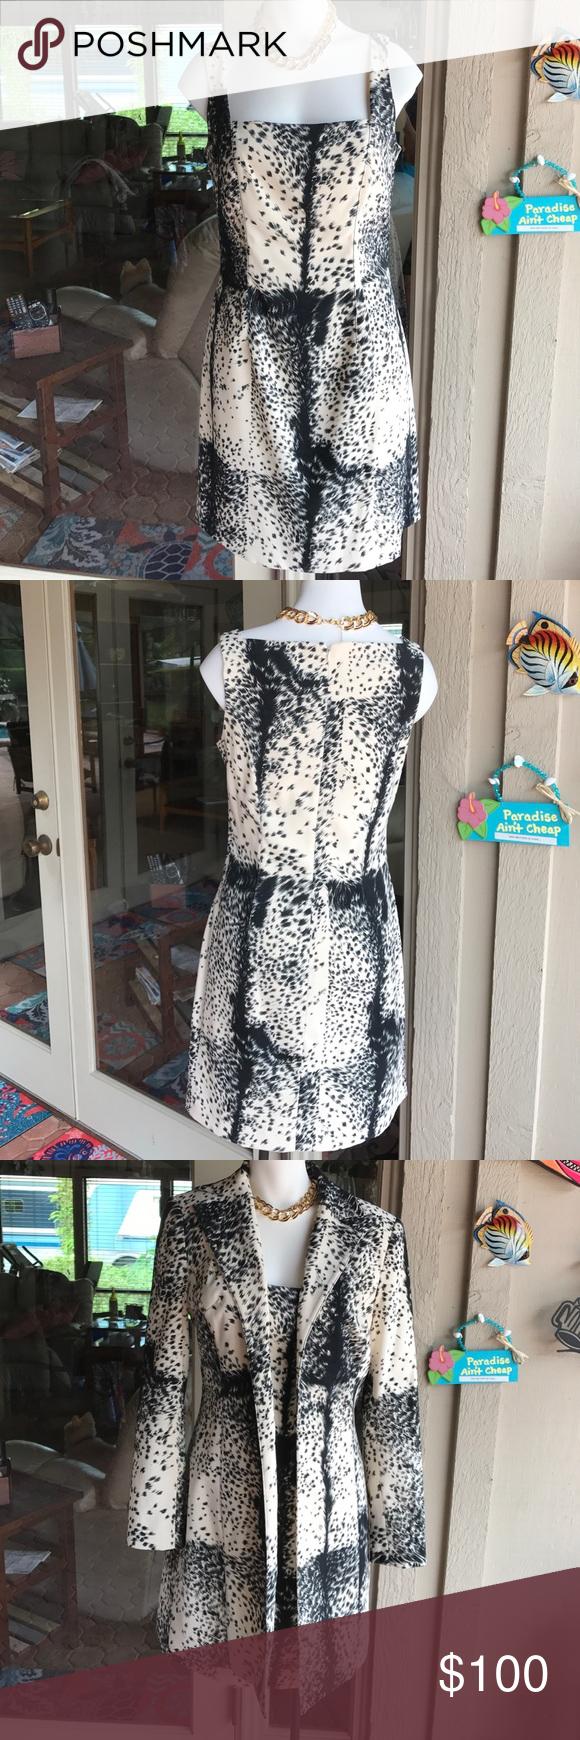 Vintage coat with matching dress ooh lala fabulous animal print